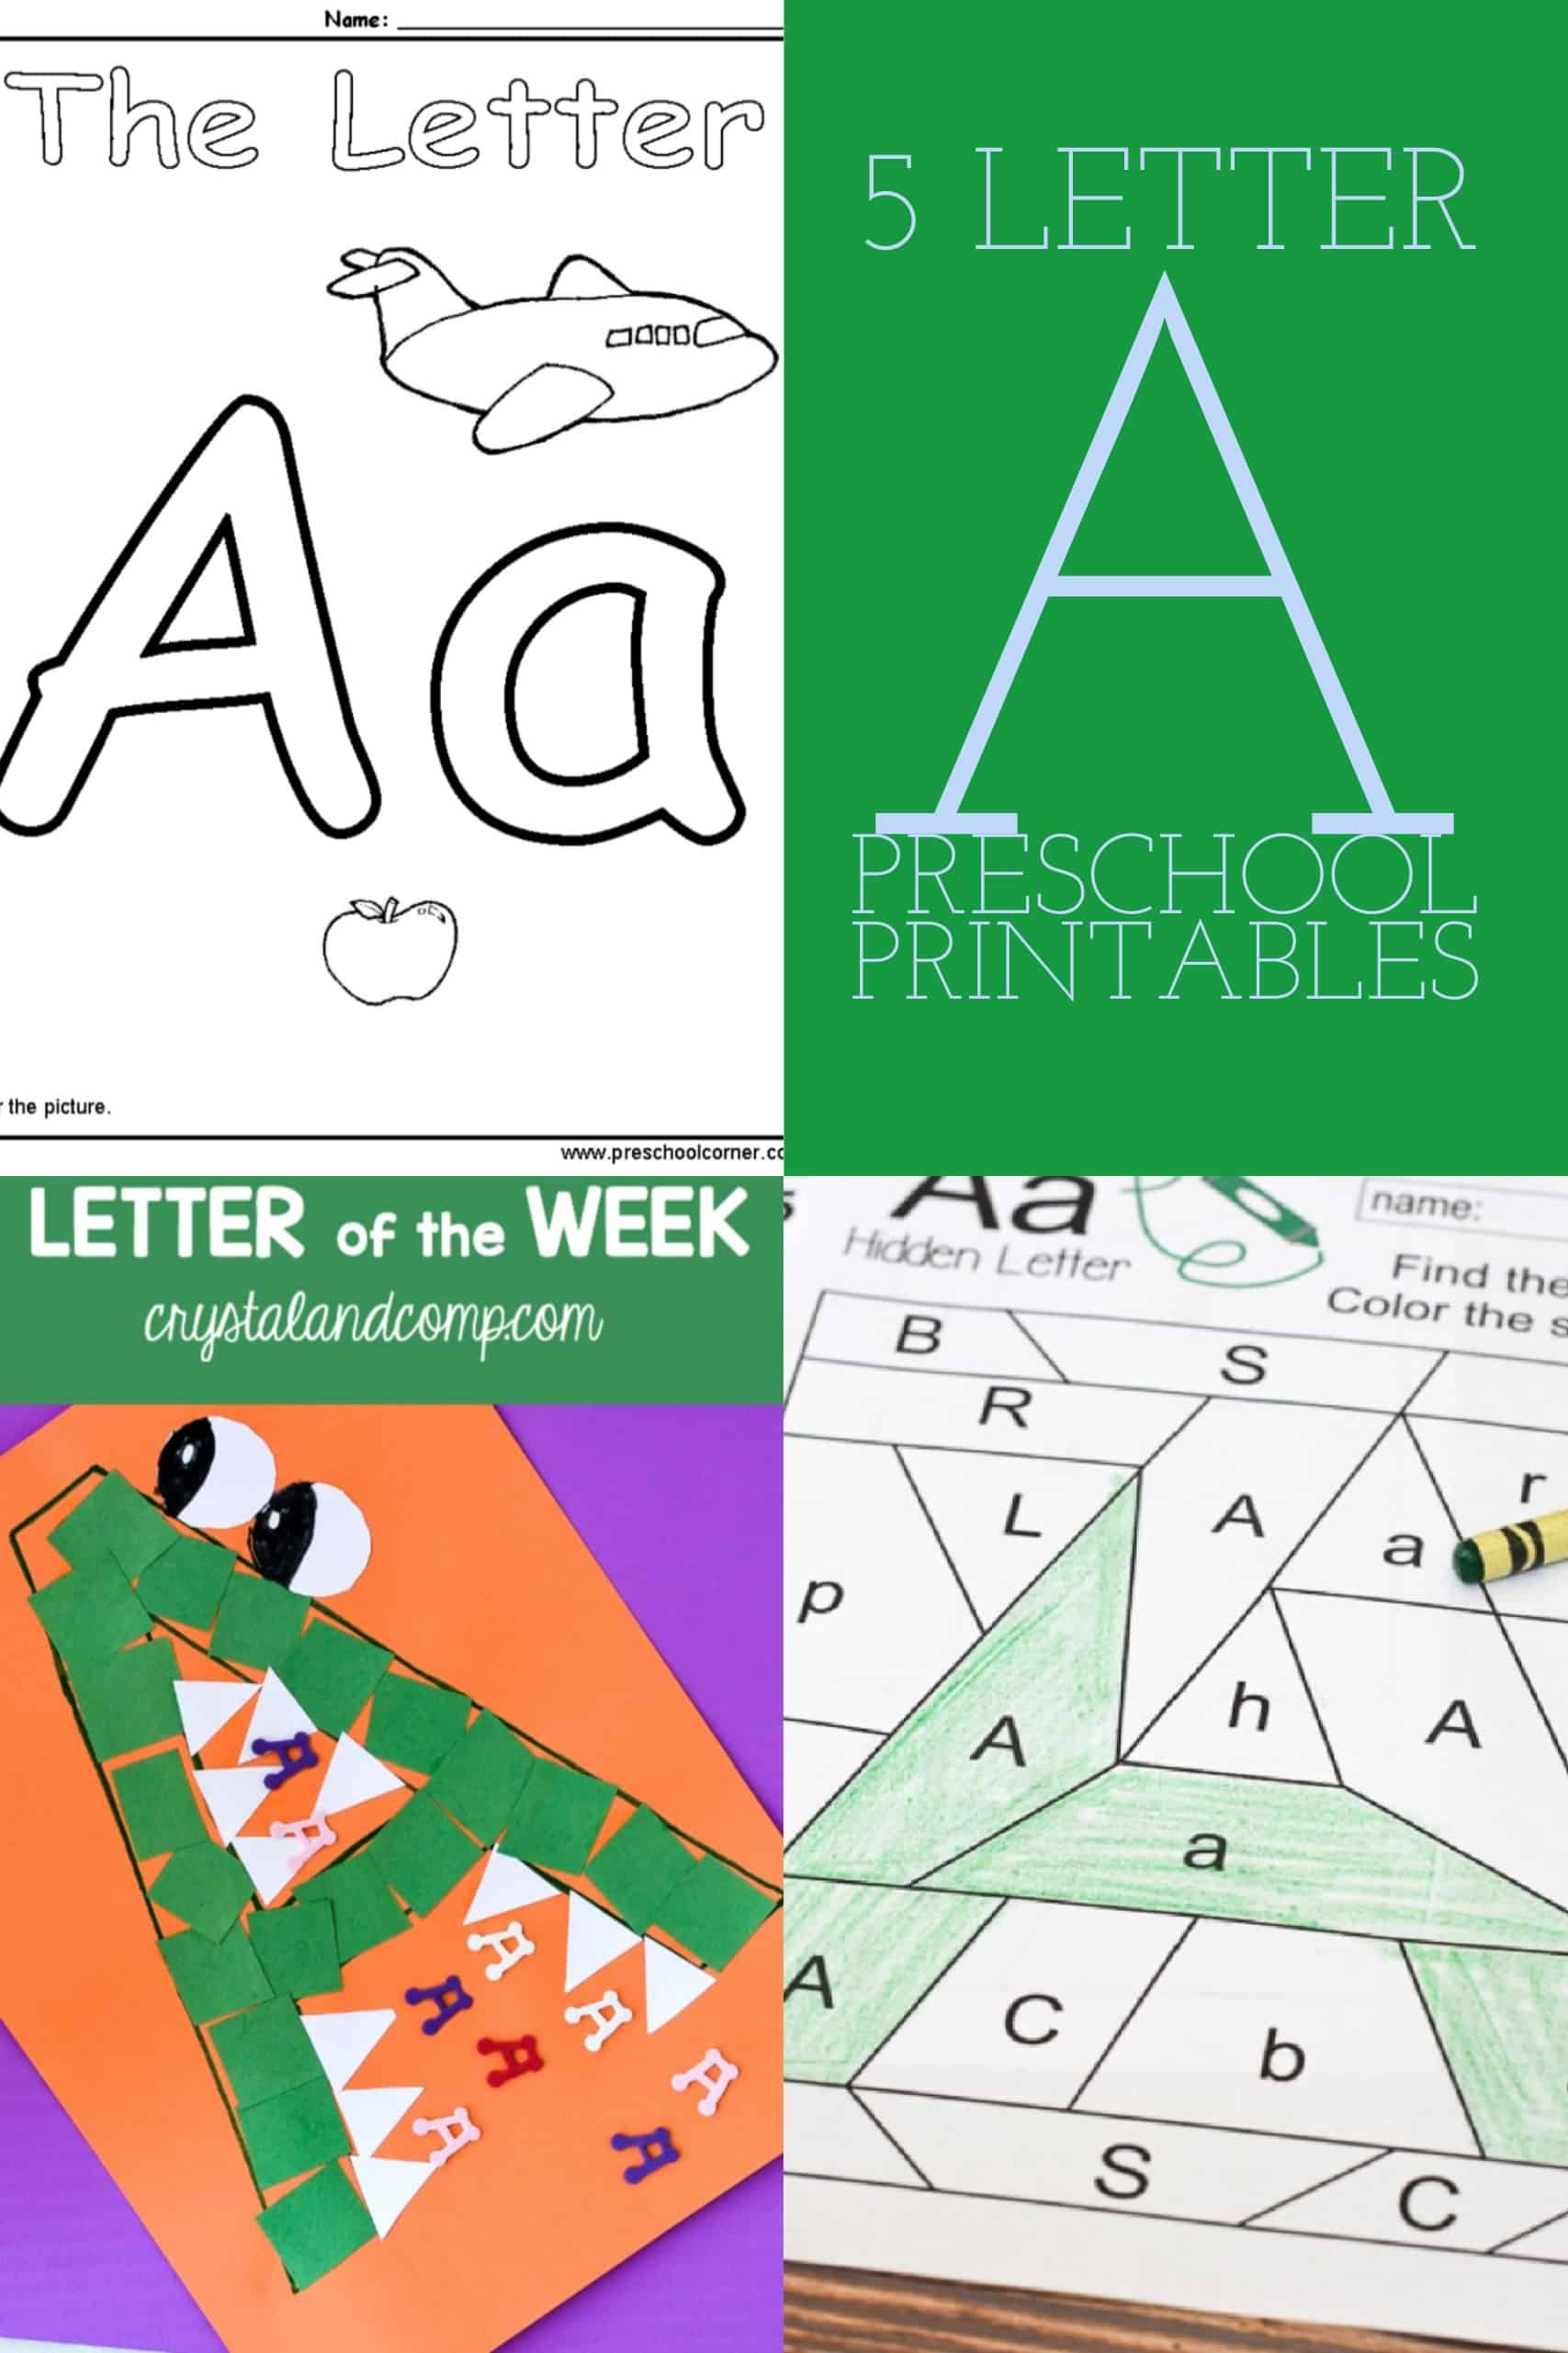 5 Letter B Preschool Printables - diy Thought